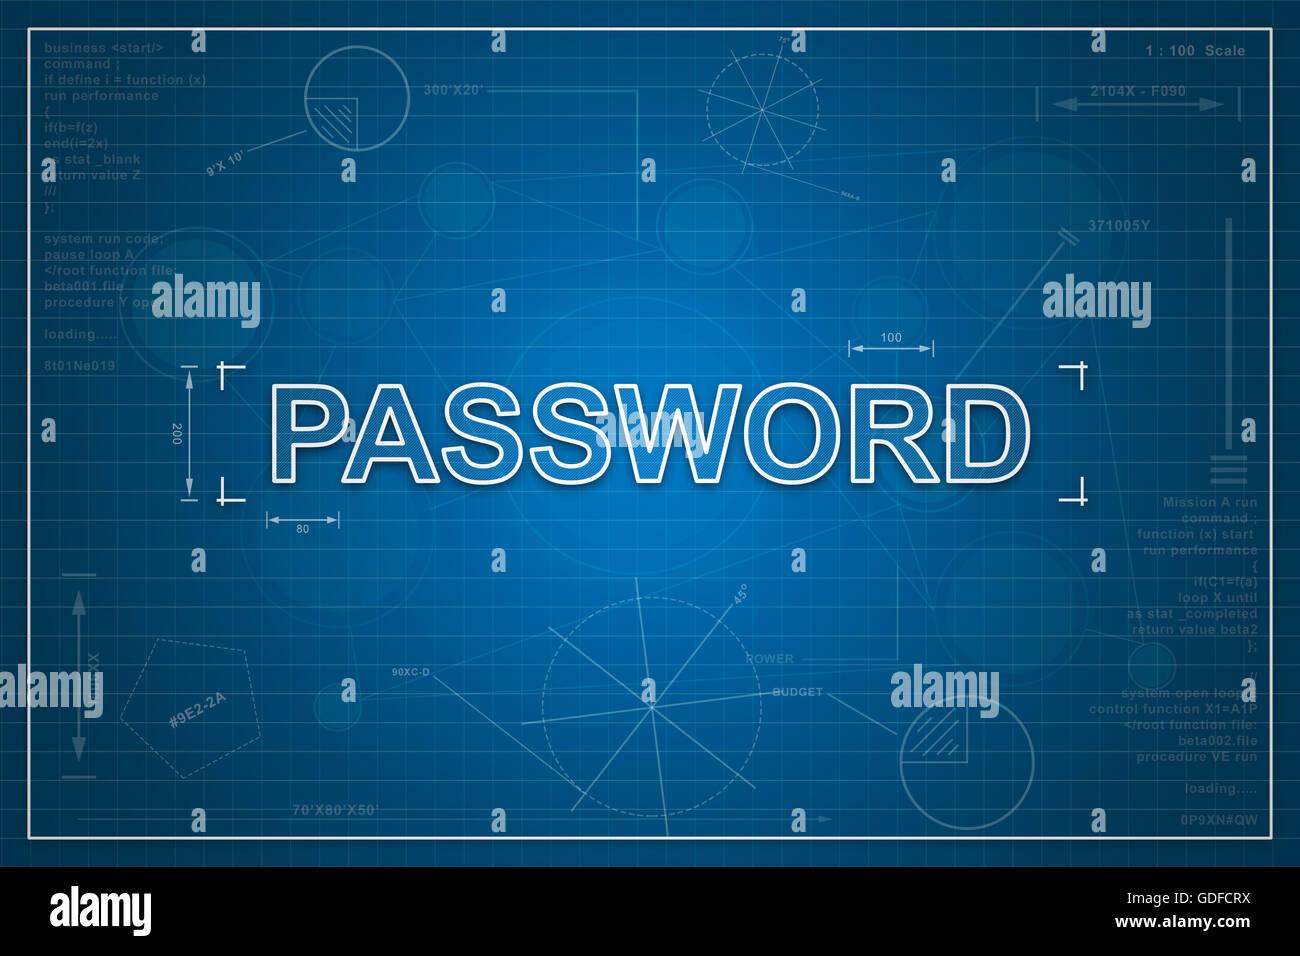 Password on paper blueprint background business concept stock photo password on paper blueprint background business concept malvernweather Gallery